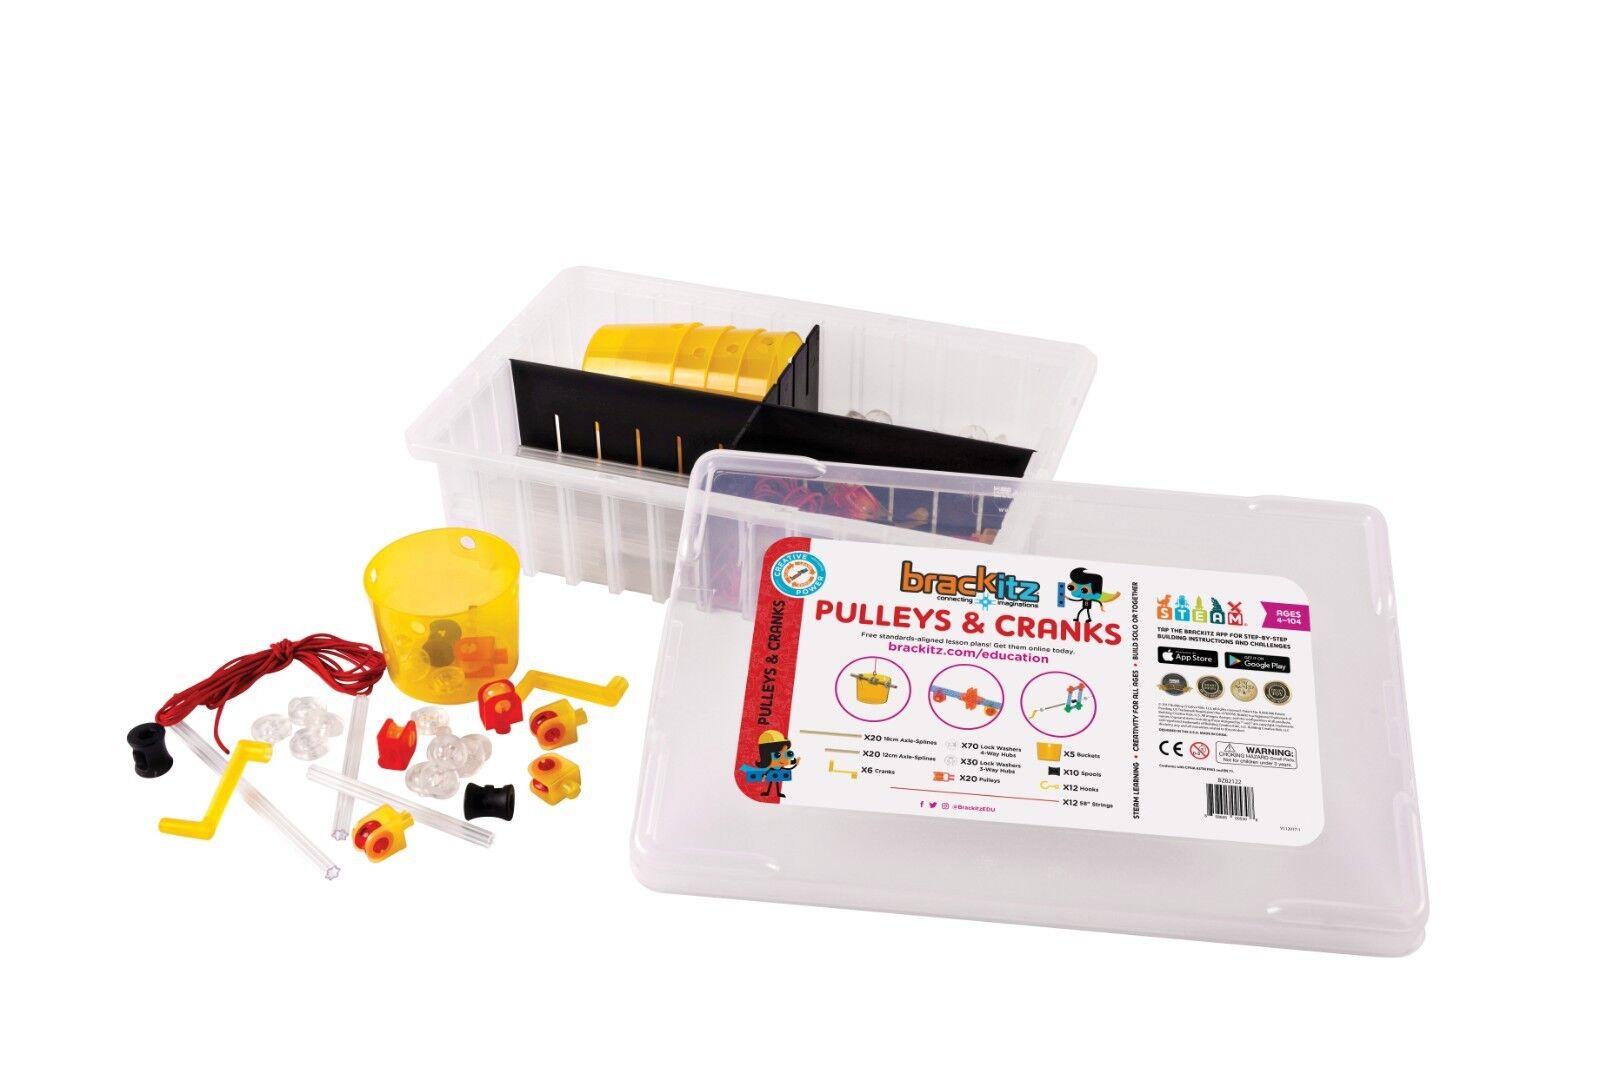 205-pc-brackitz-pulleys-cranks-stem-learning-toys-kids-prek-6-extension-set